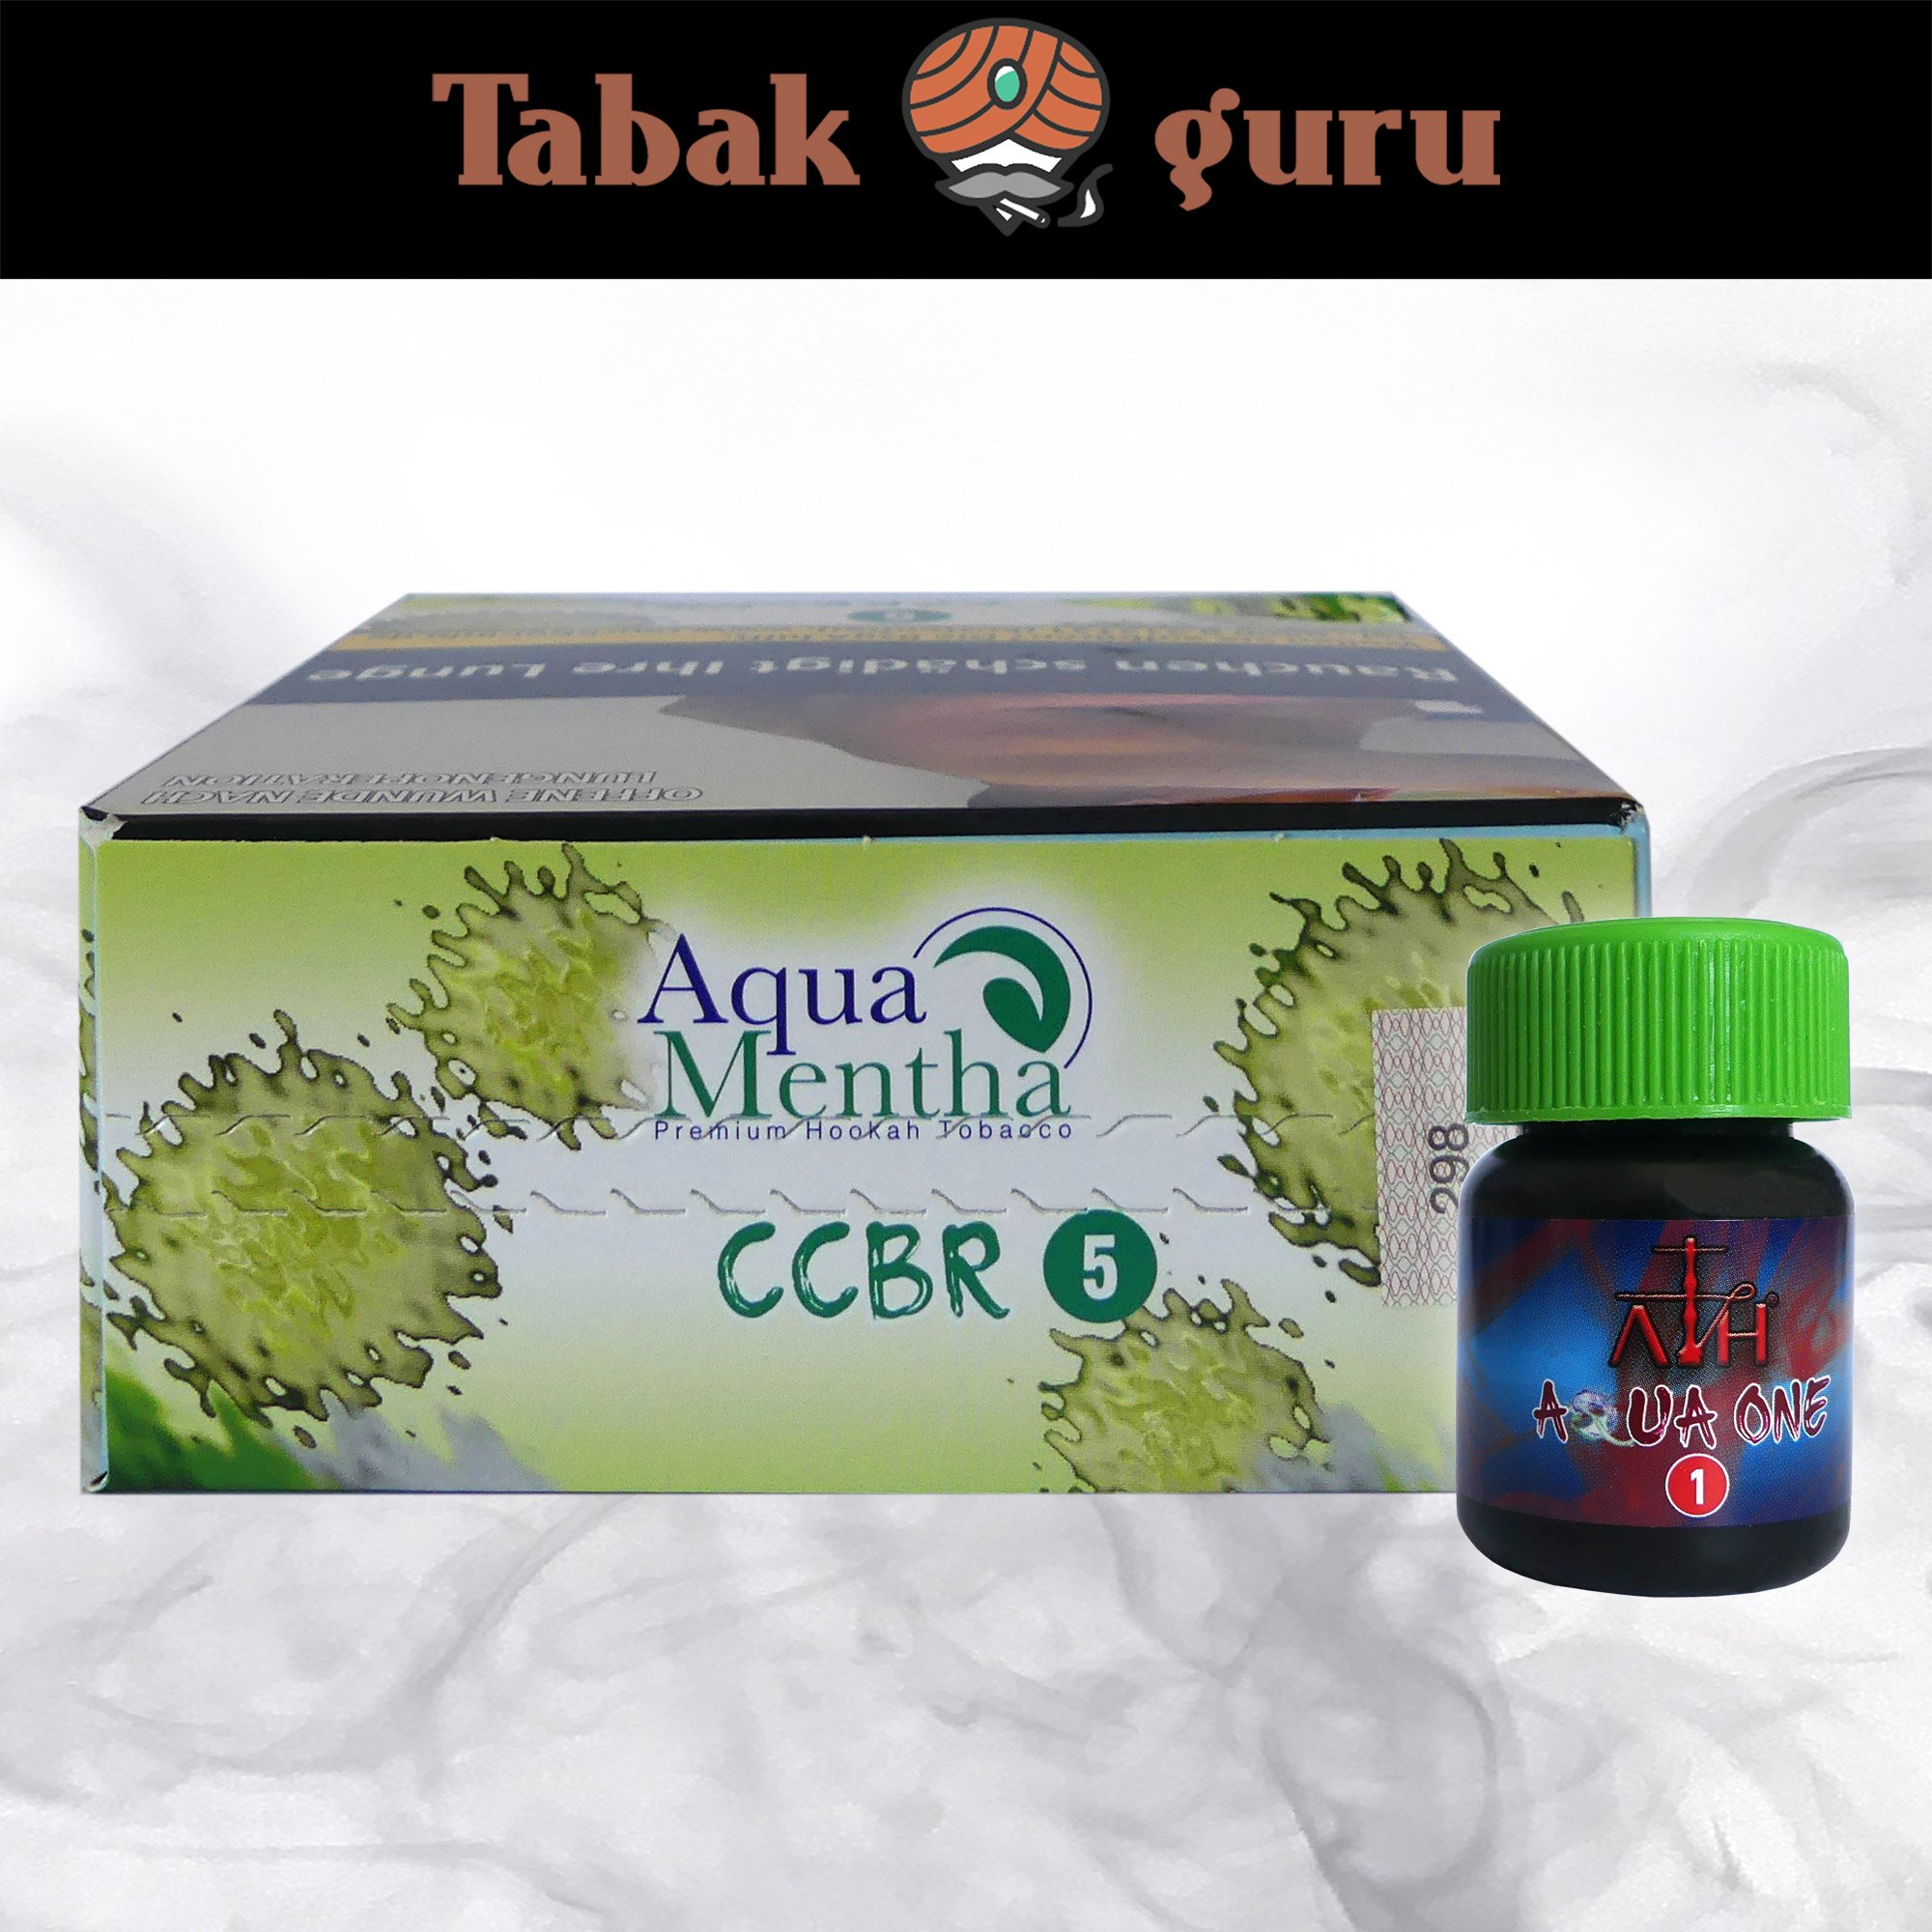 Aqua Mentha CCBR #5 (Gurke) 200g Shisha Tabak + ATH Aqua One Mix